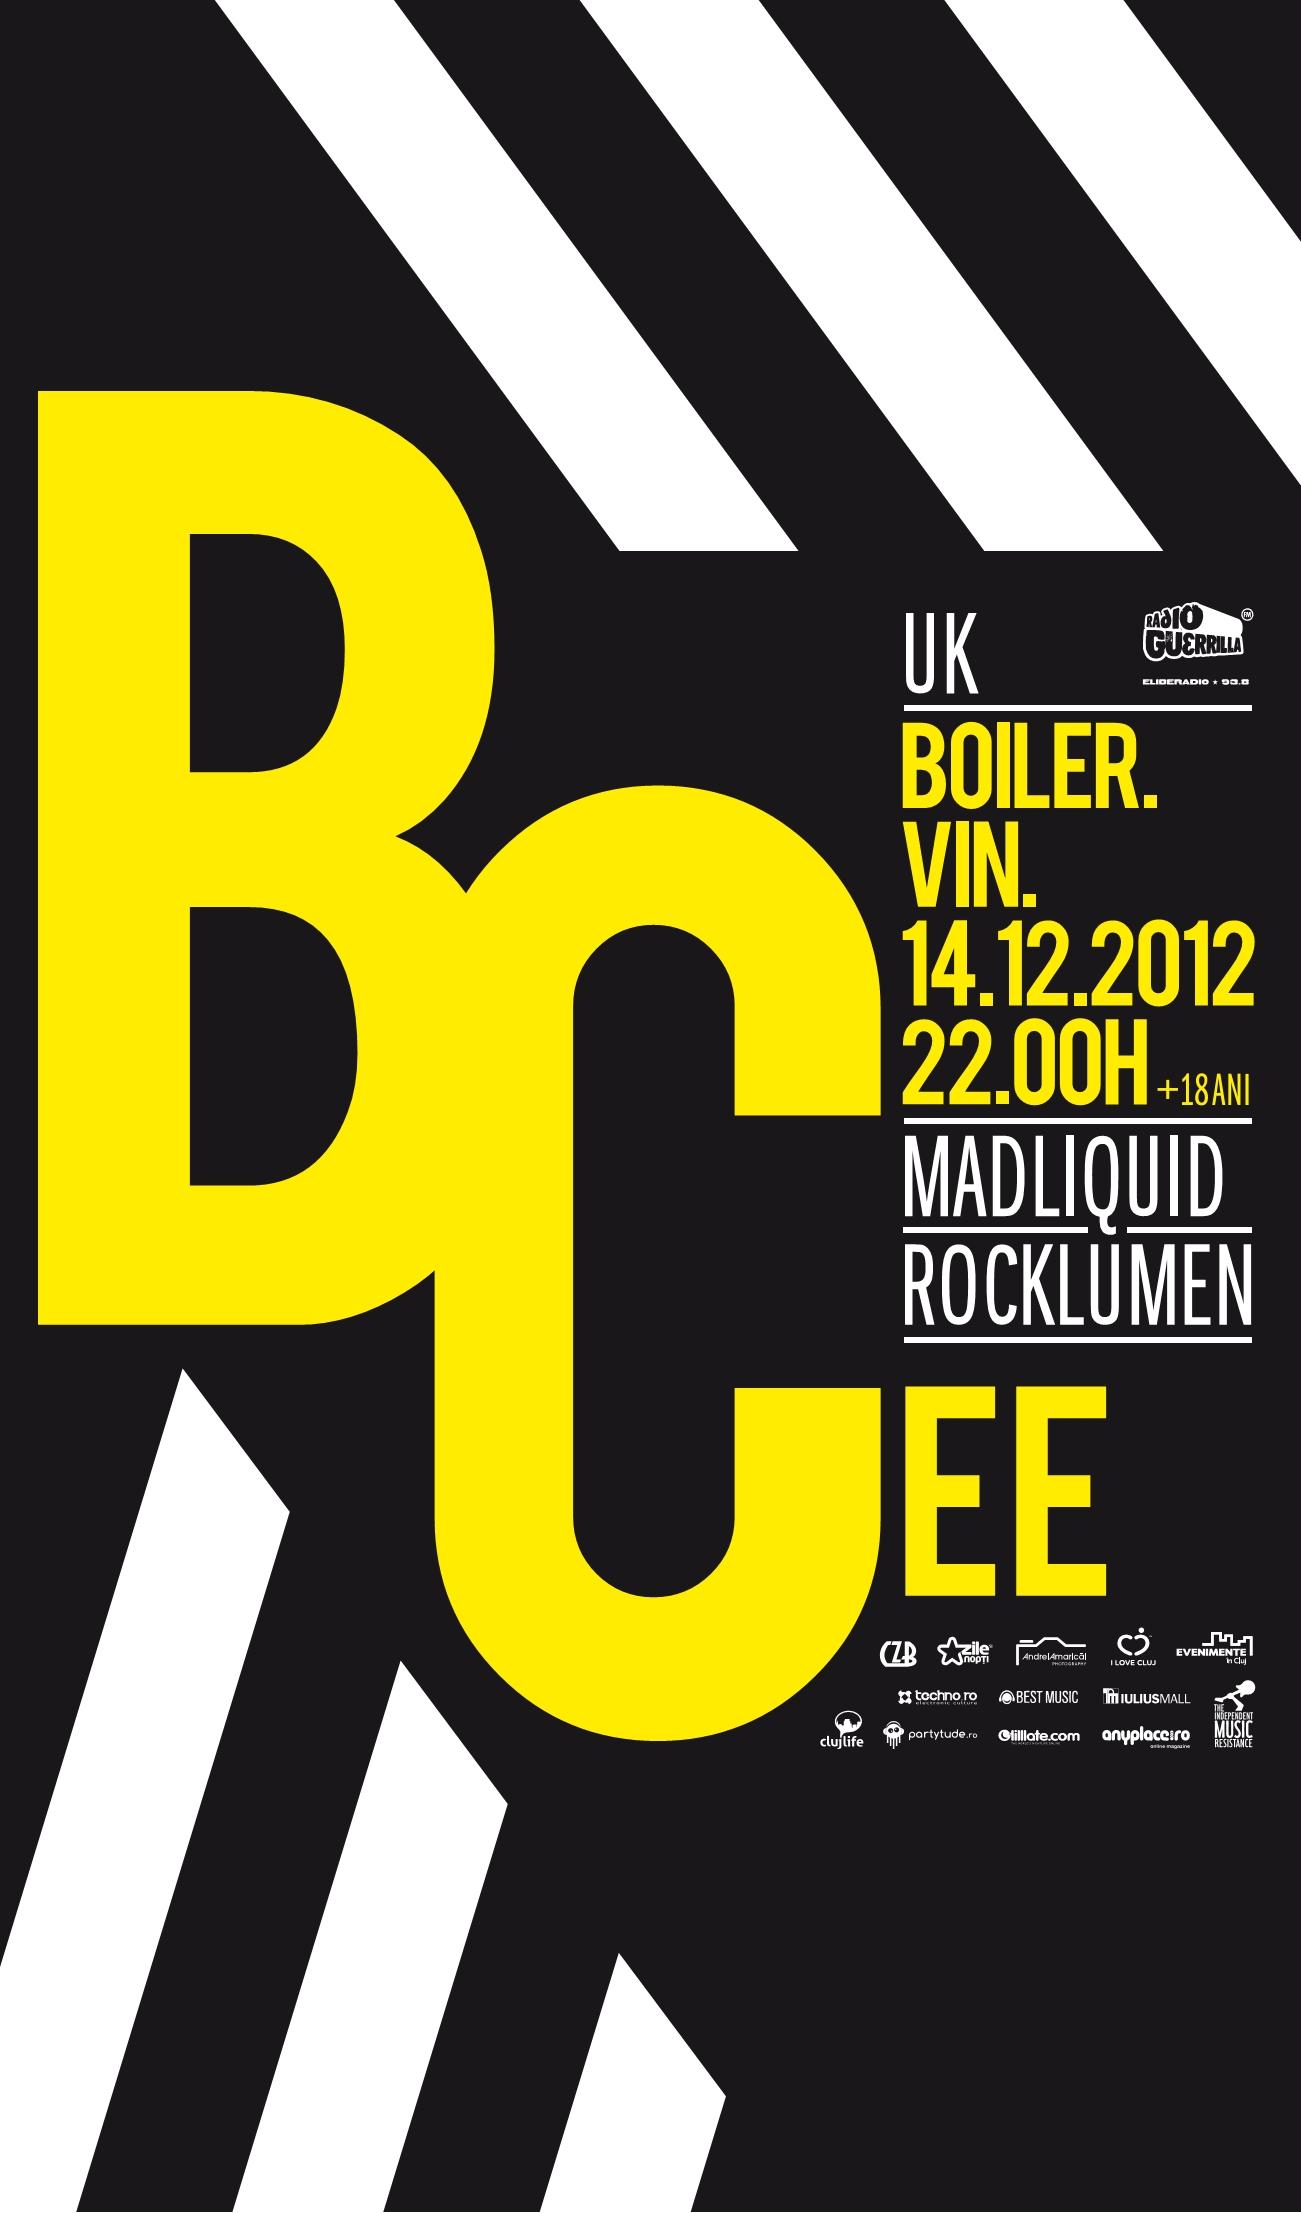 BCee @ Boiler Club